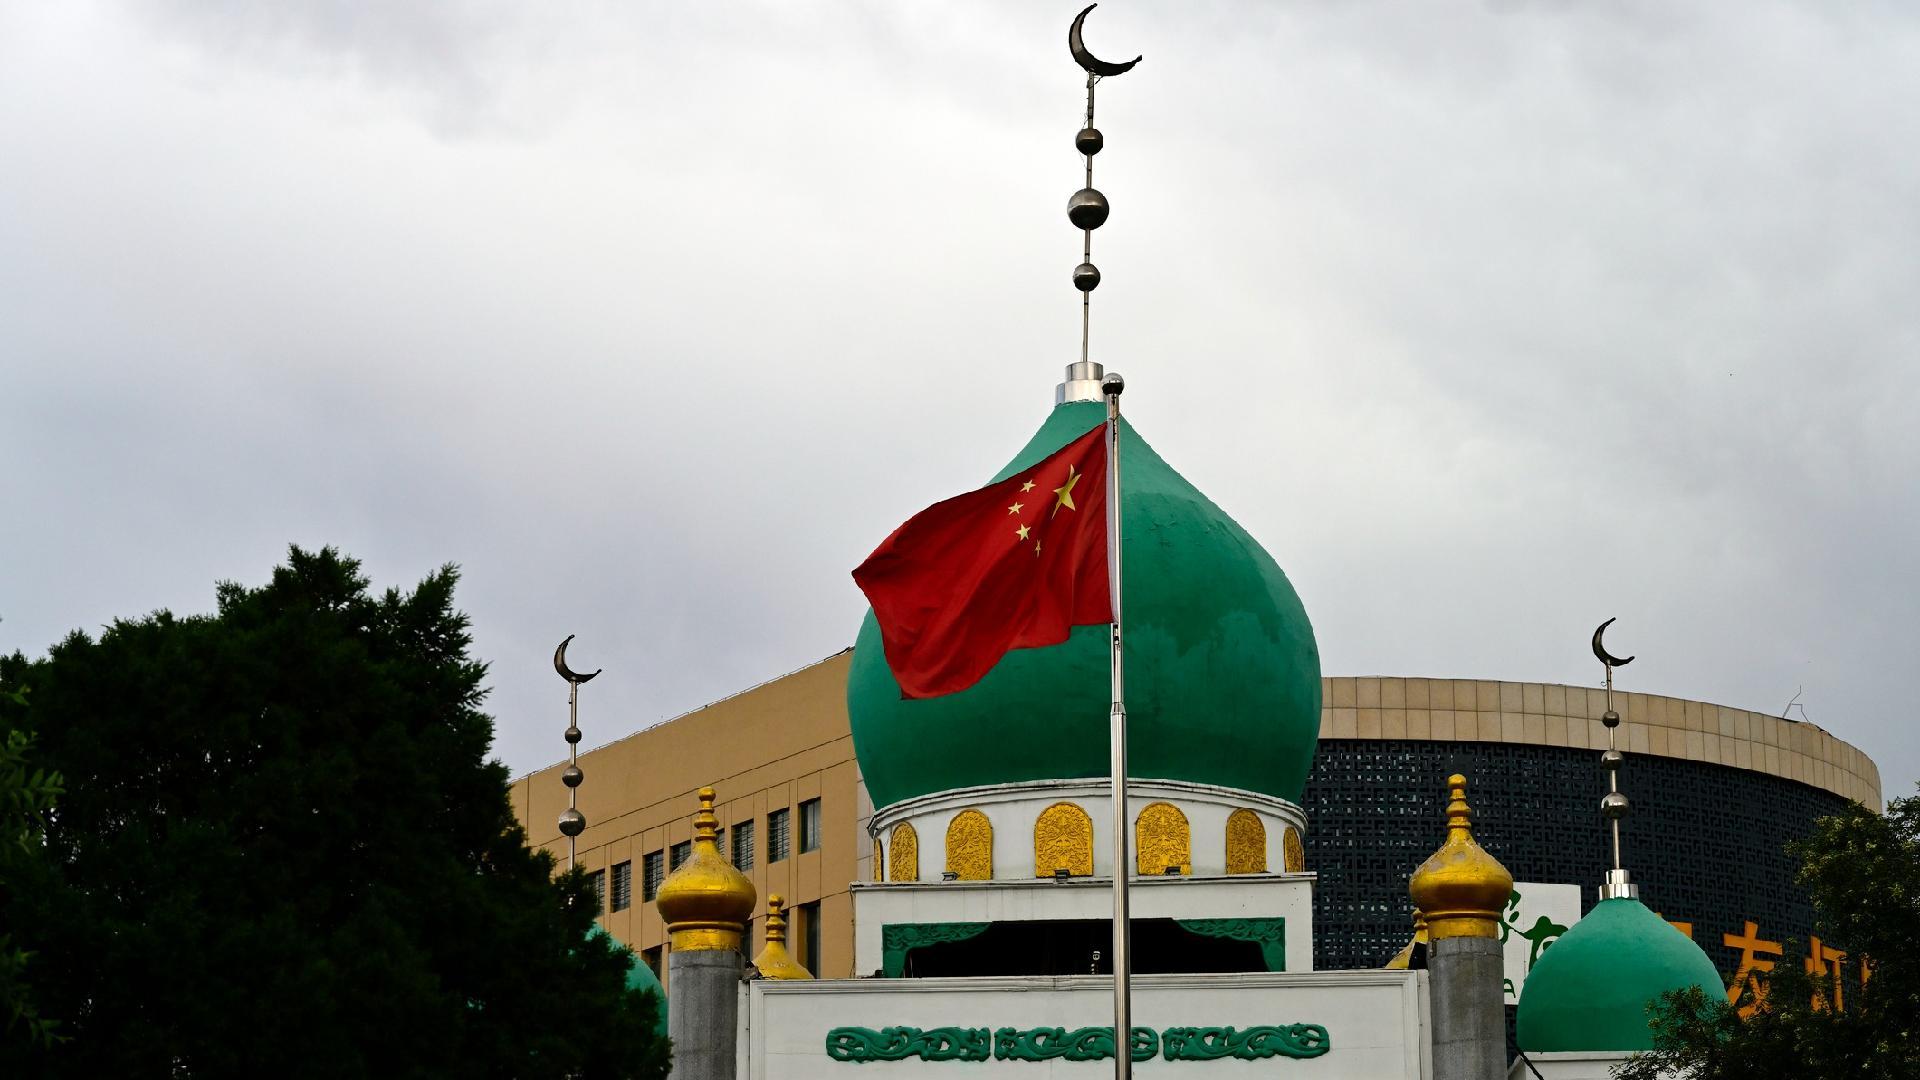 news.cgtn.com: China and the Muslim world: Civilizational partnership?